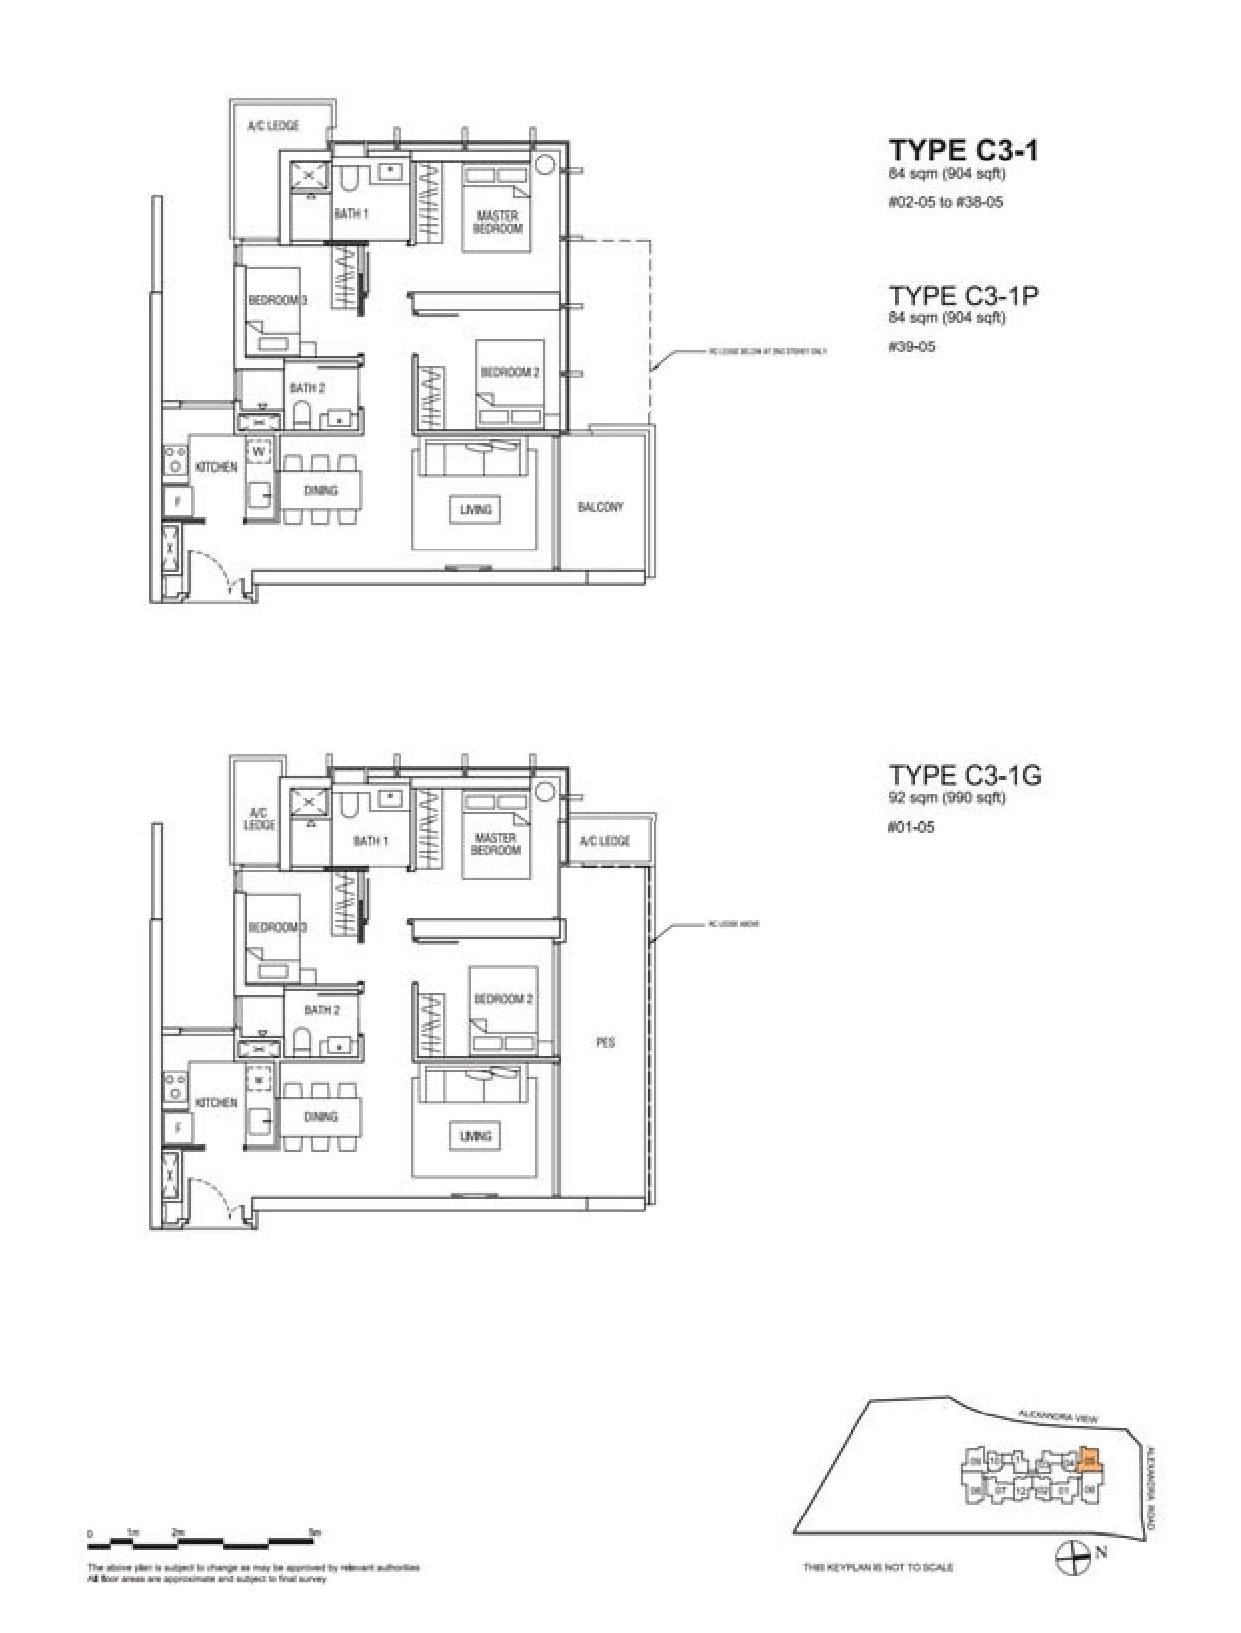 Alex Residences 3 Bedroom Floor Plans Type C3-1, C3-1P, C3-1G